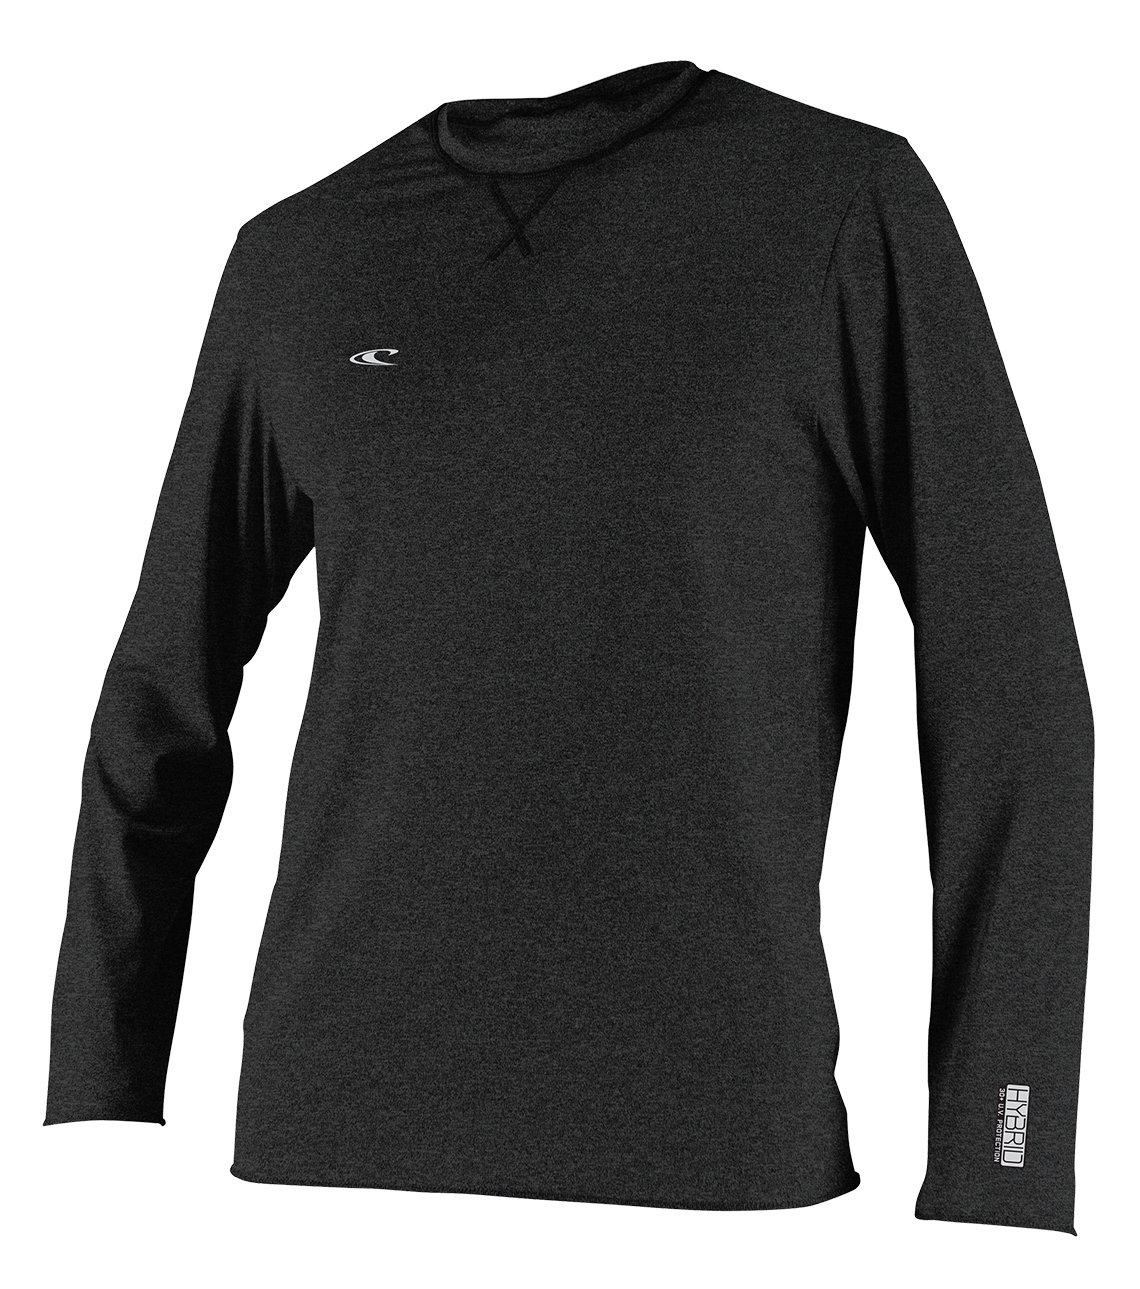 O'Neill Wetsuits  Men's Hybrid UPF 50+ Long Sleeve Sun Shirt,Black,XX-Large by O'Neill Wetsuits